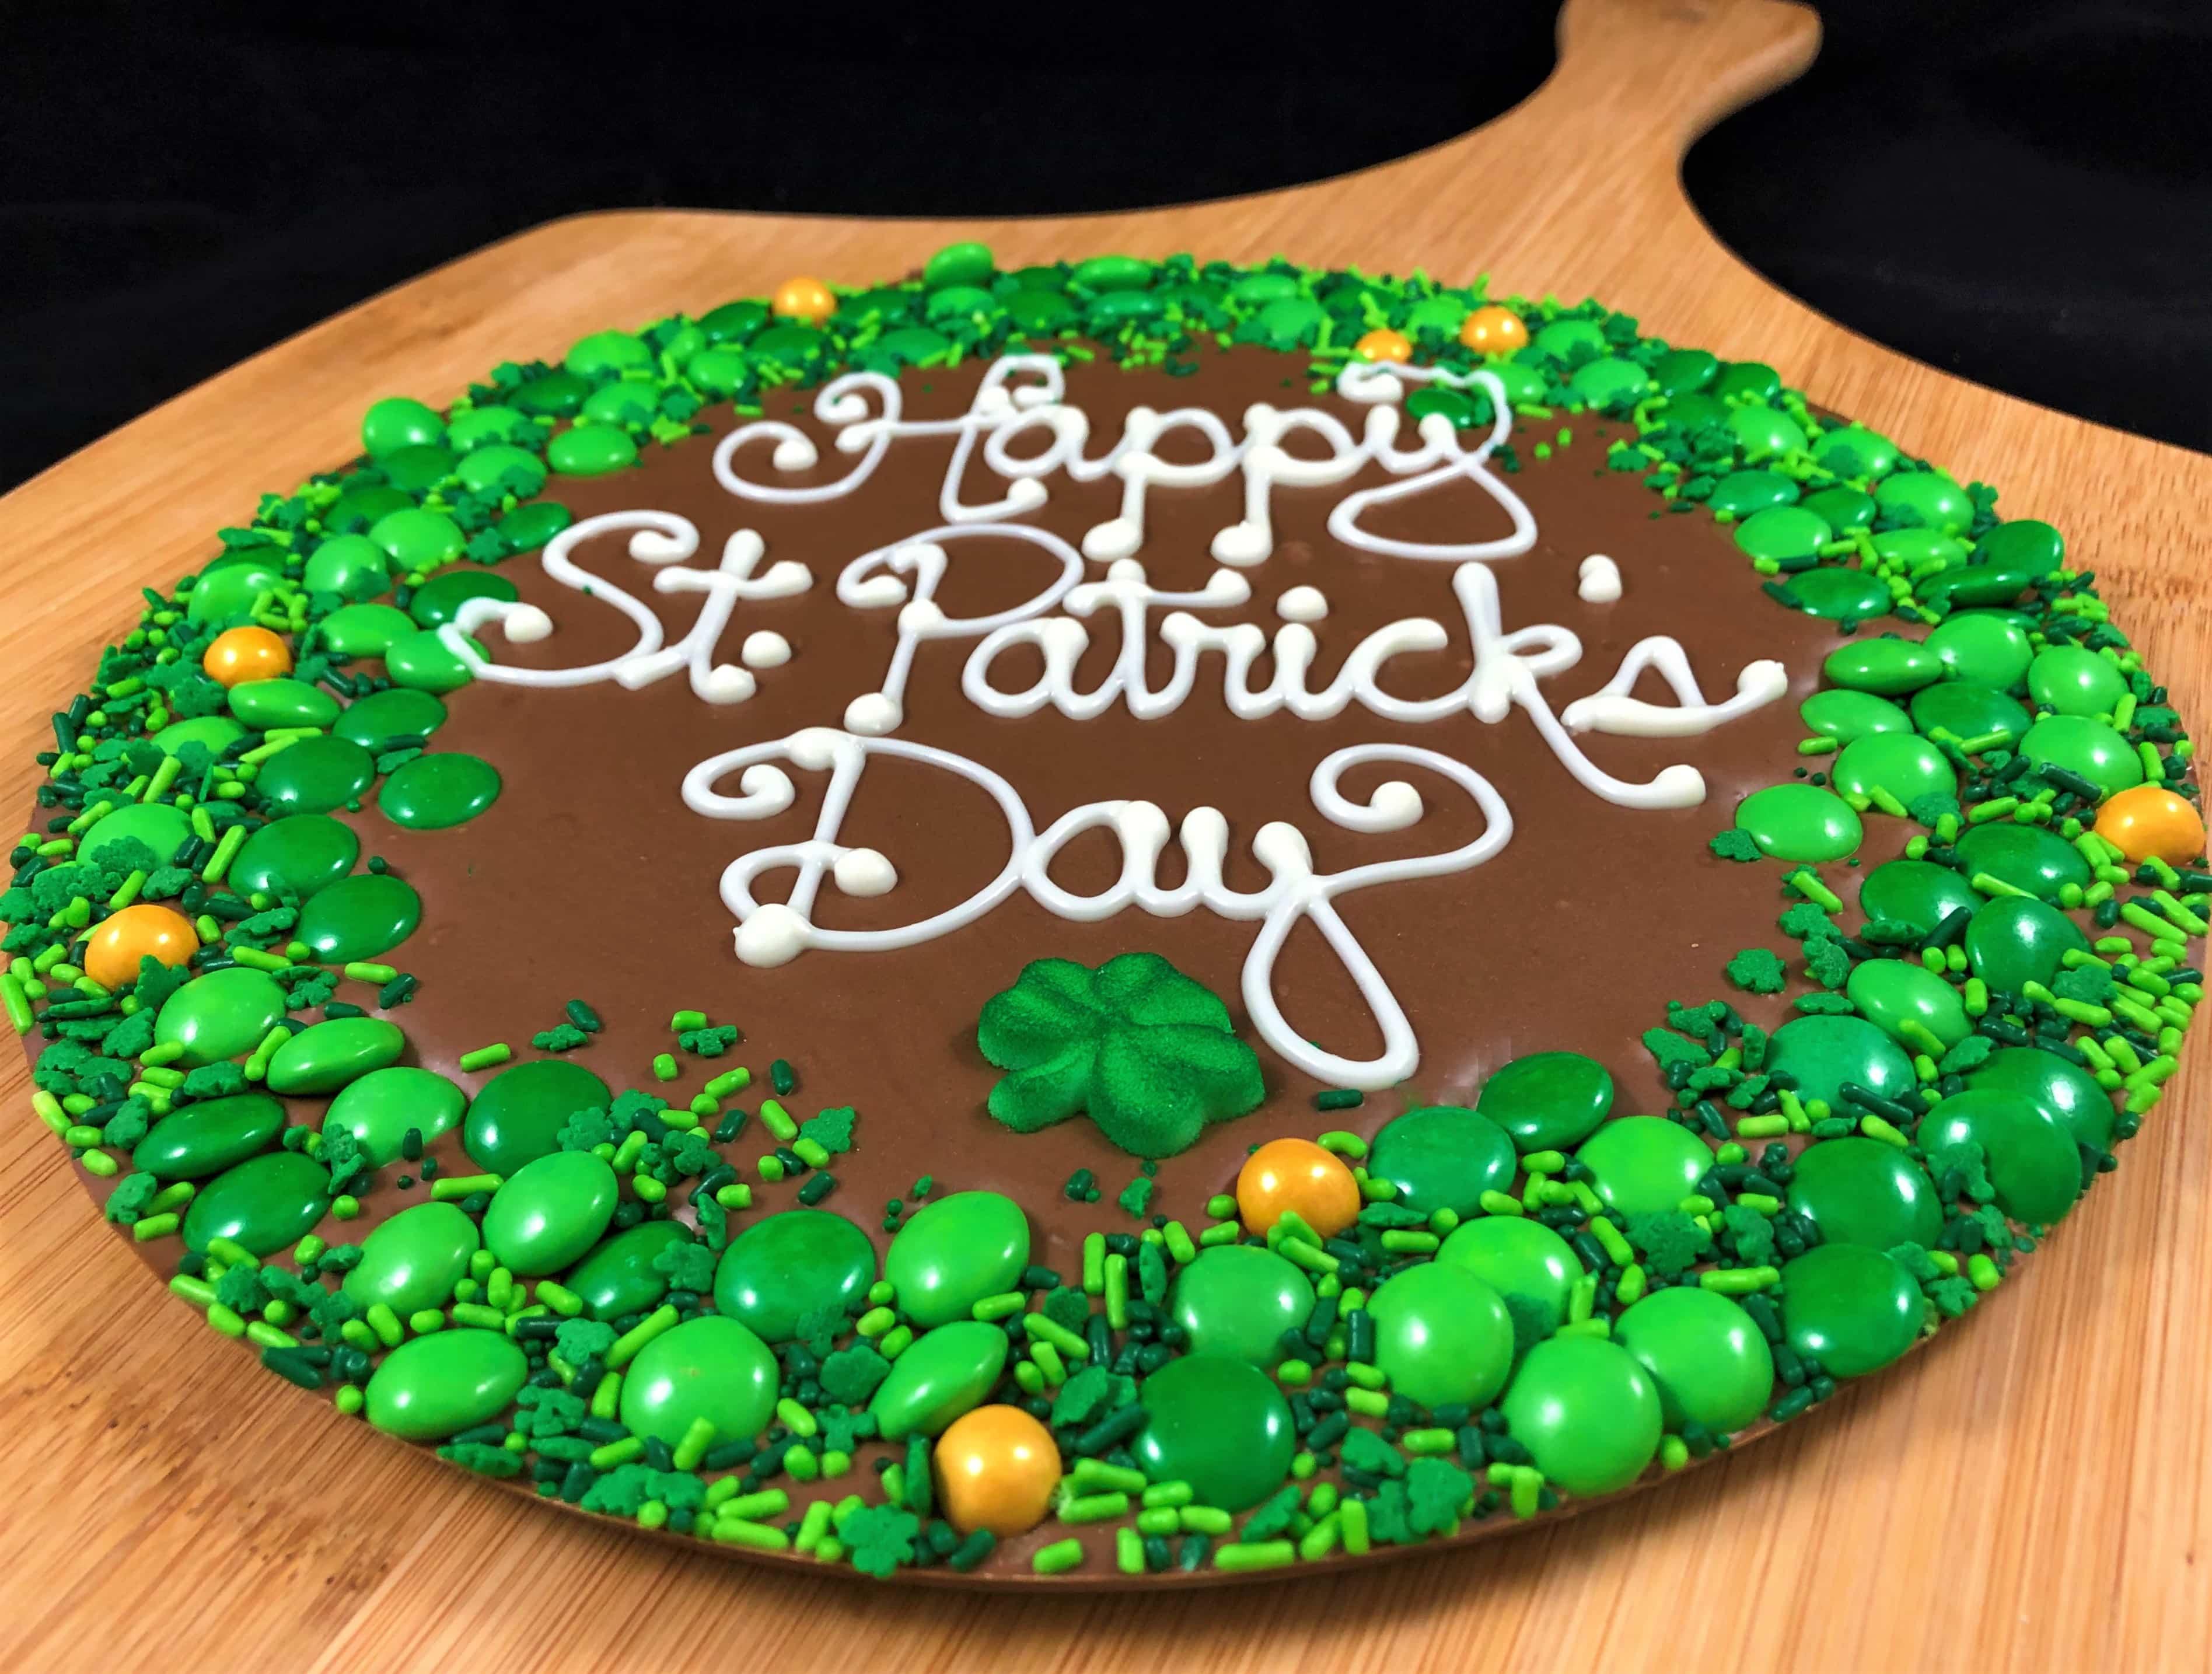 Astonishing St Patricks Day Chocolate Pizza Chocolatepizza Com Funny Birthday Cards Online Necthendildamsfinfo